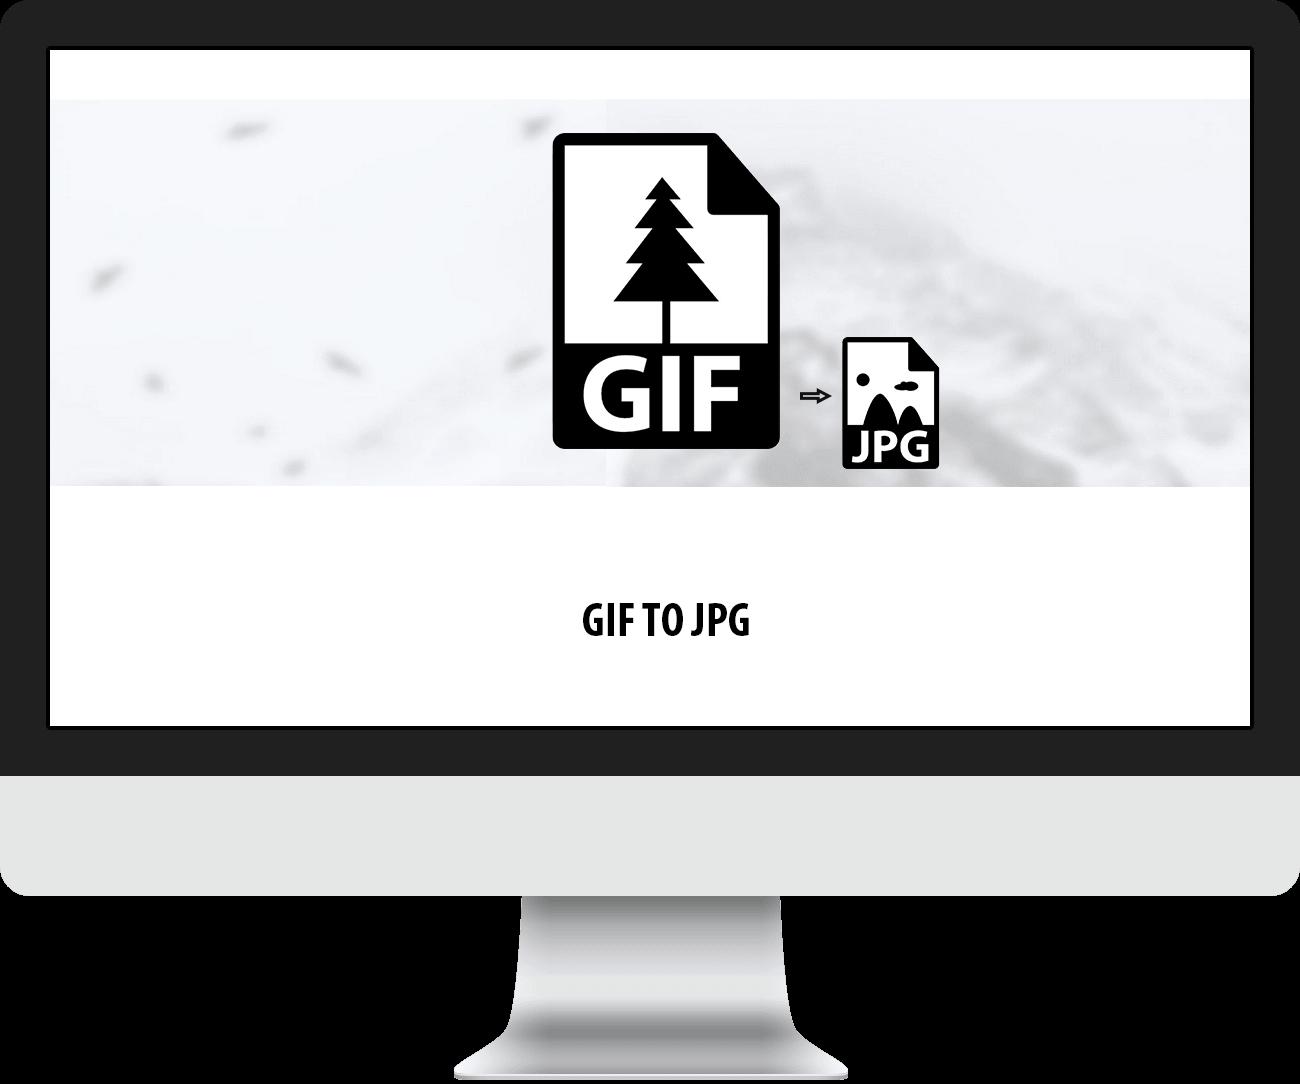 GIF TO JPG